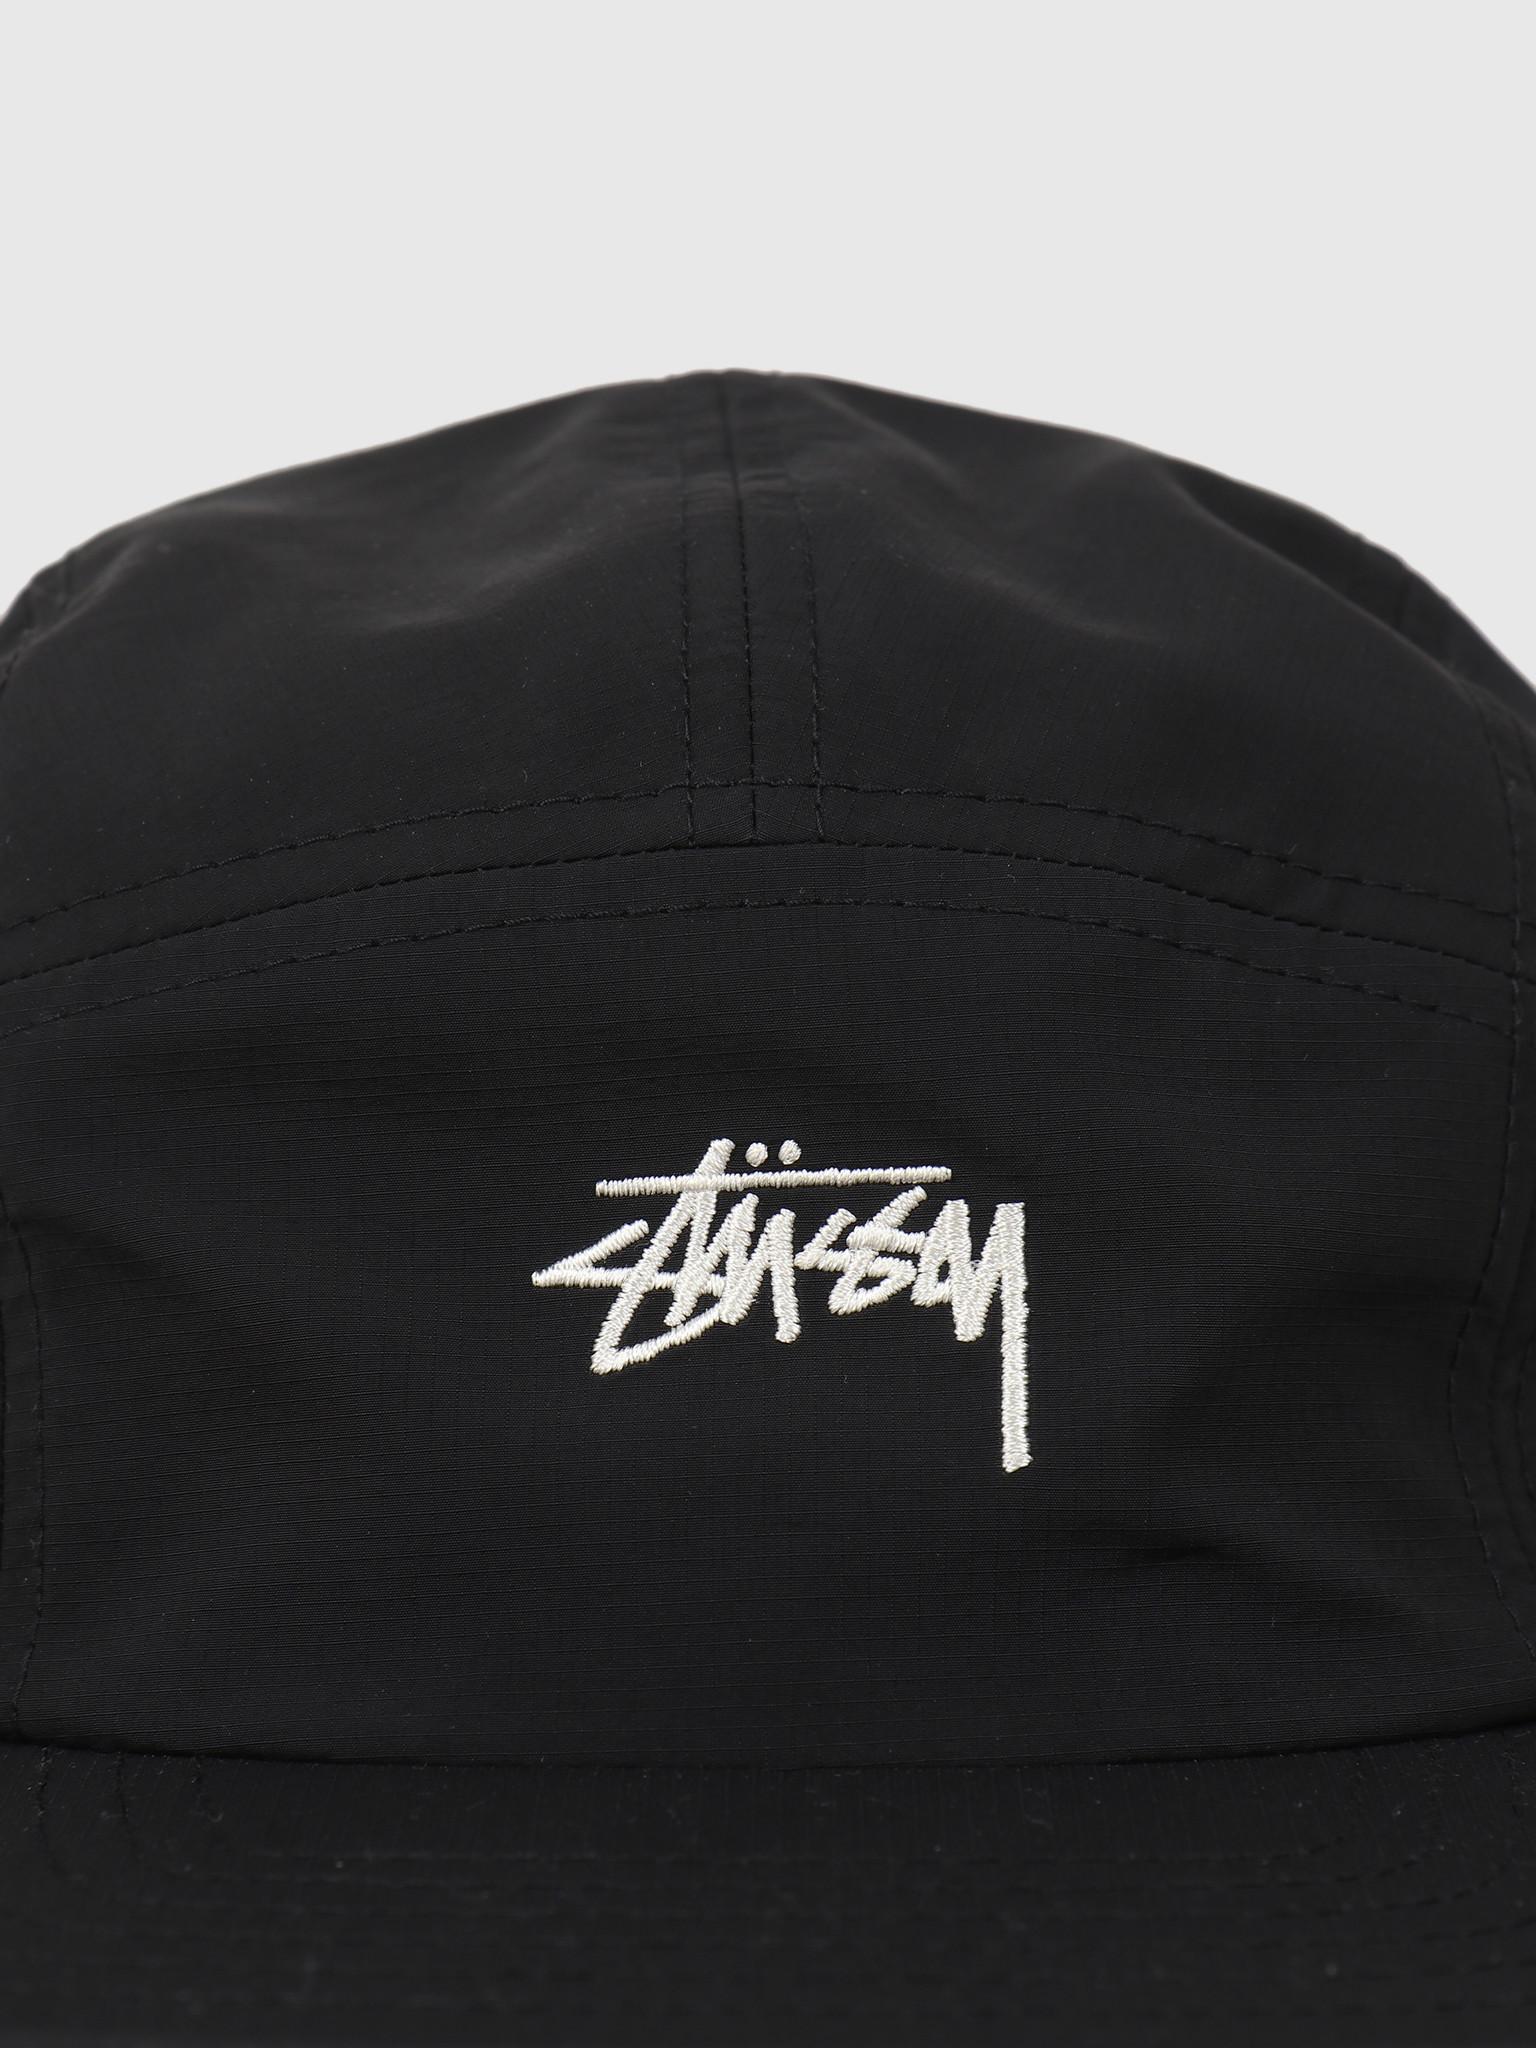 Stussy Stussy Stock Nylon Ripstop Camp Cap Black 132982